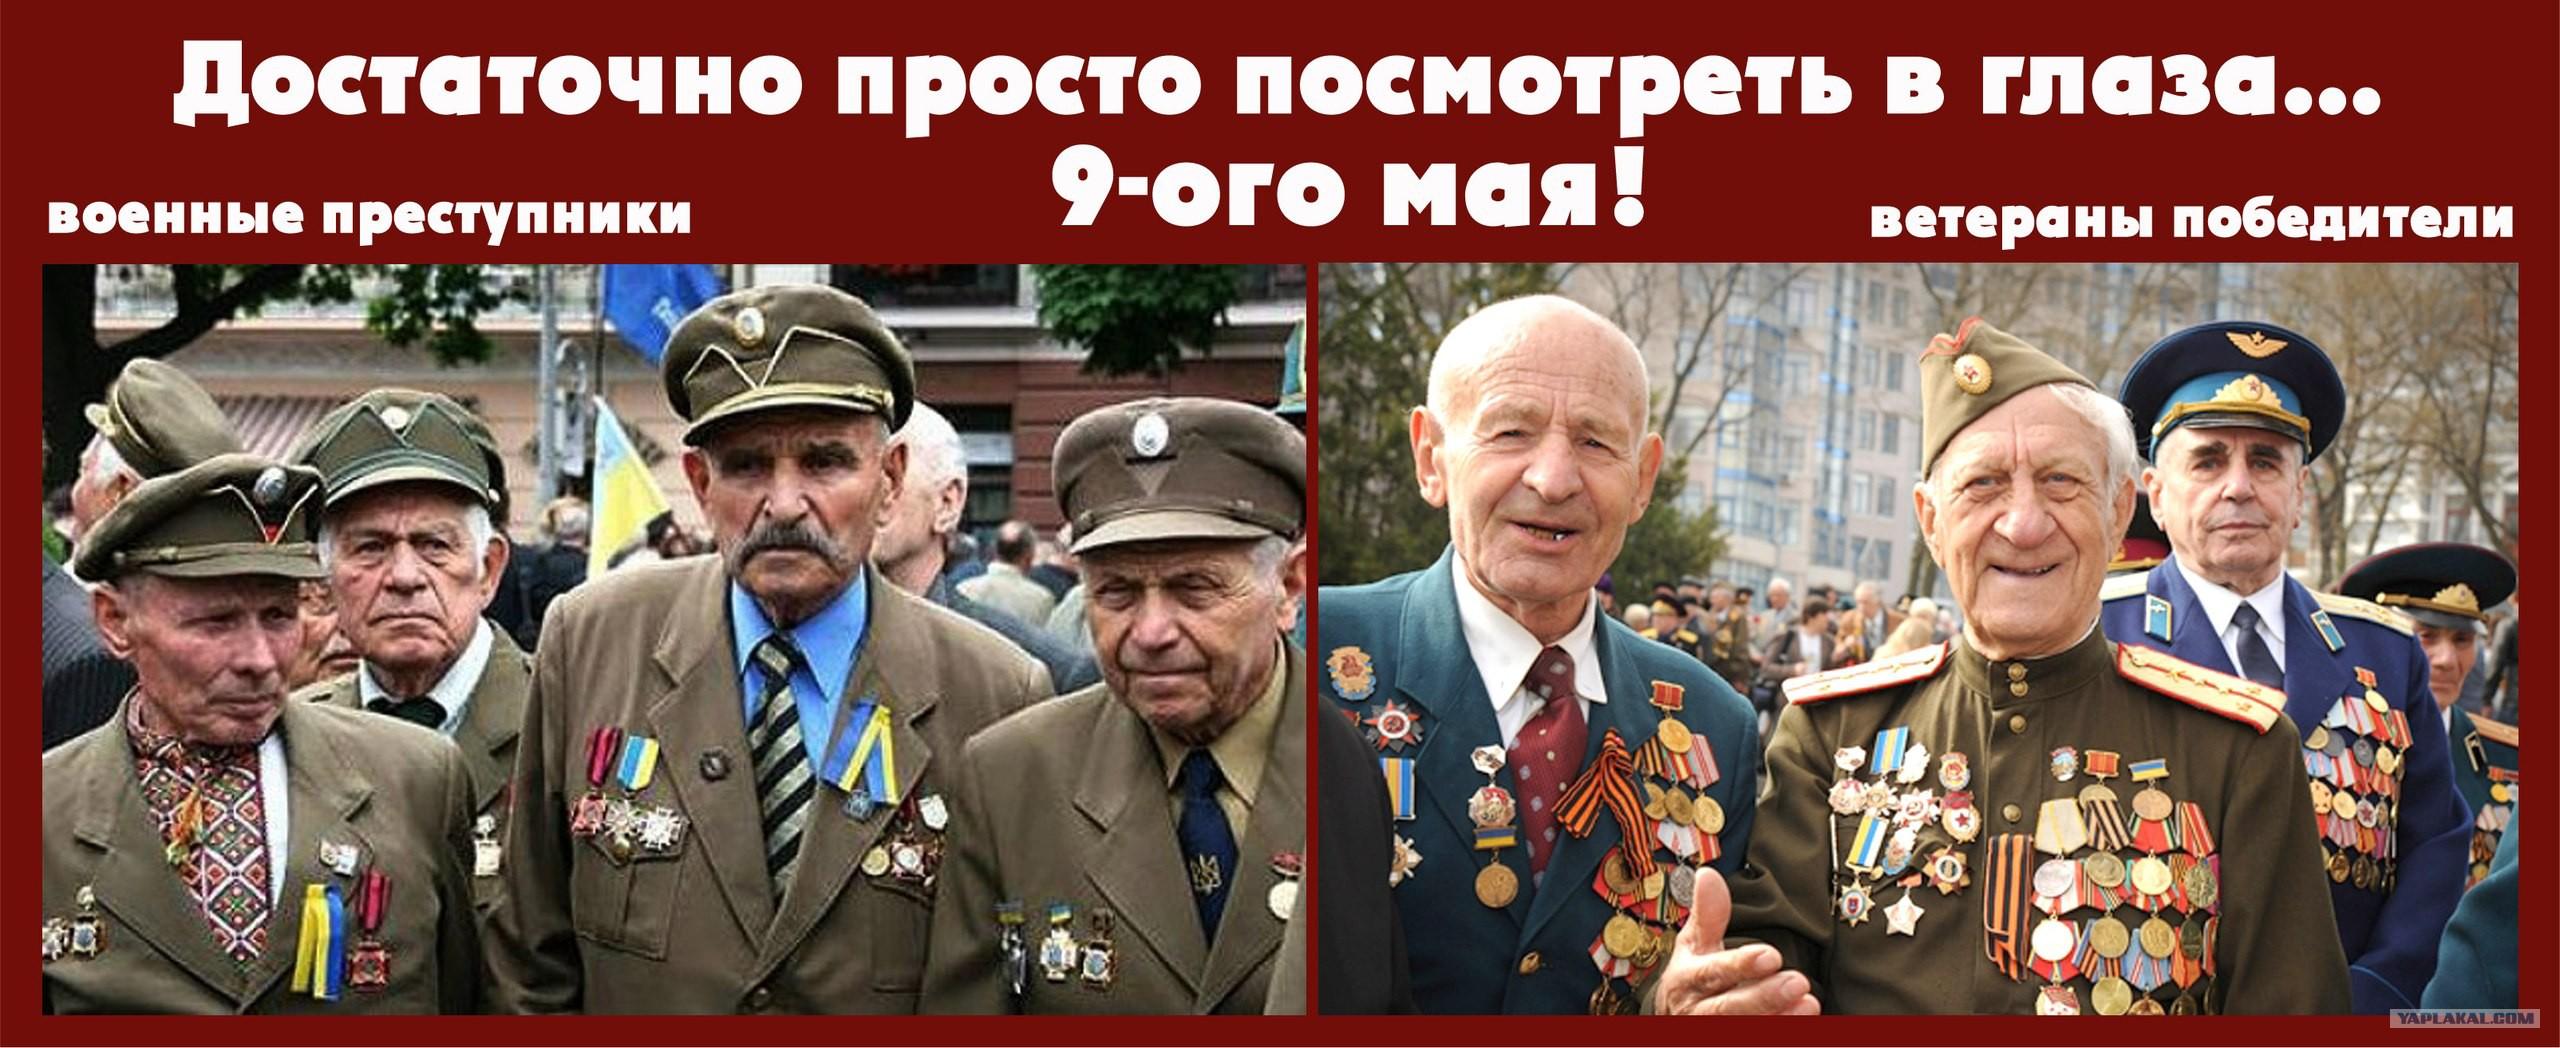 На Украине причислили УПА к победителям над нацизмом